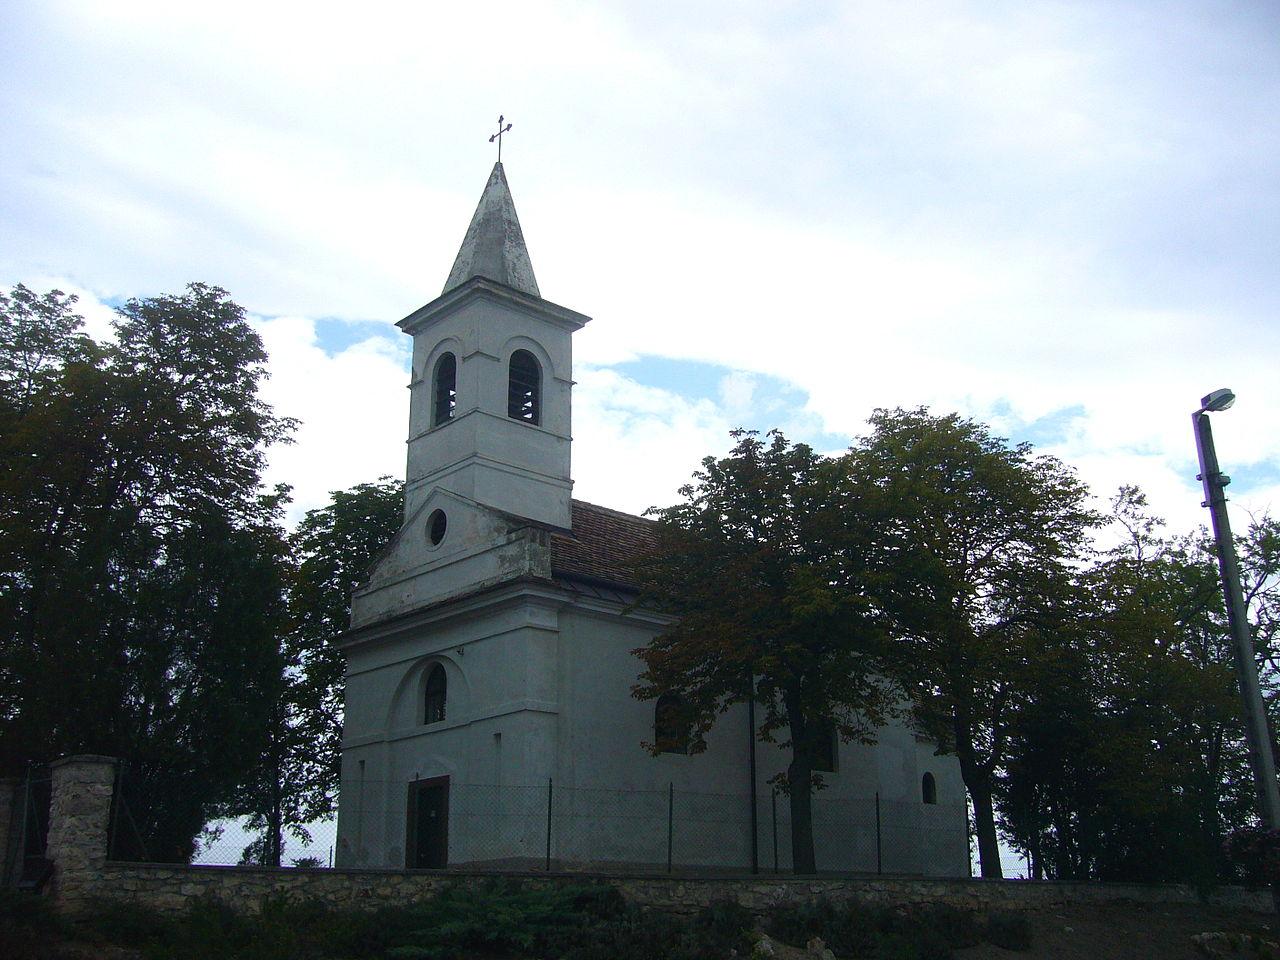 Balatonudvari katolikus templom - magyartemplomok.hu